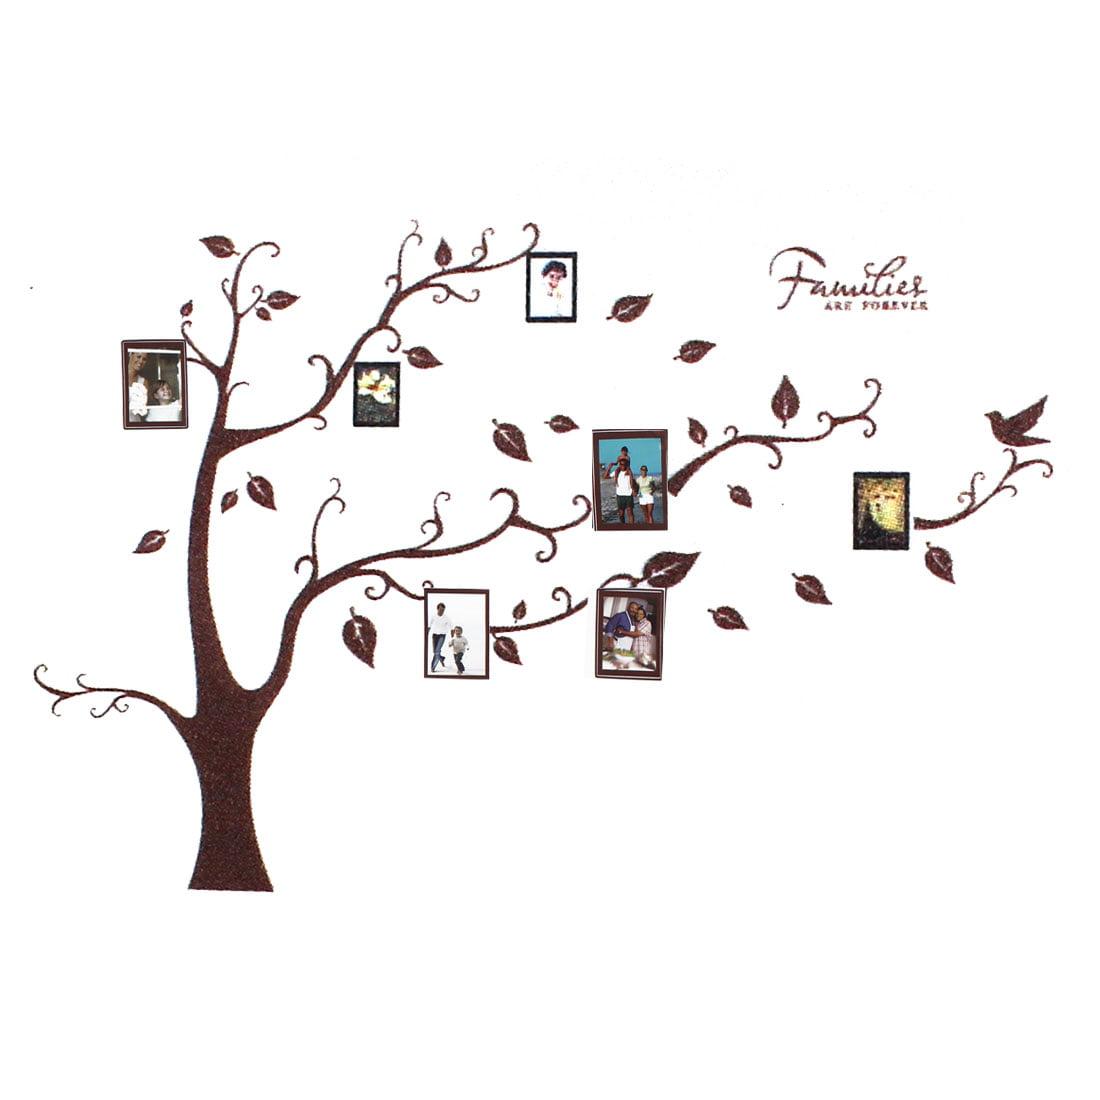 Vinyl Families Tree Branch Trunk Wall Art Sticker Decal Home Decor Mural